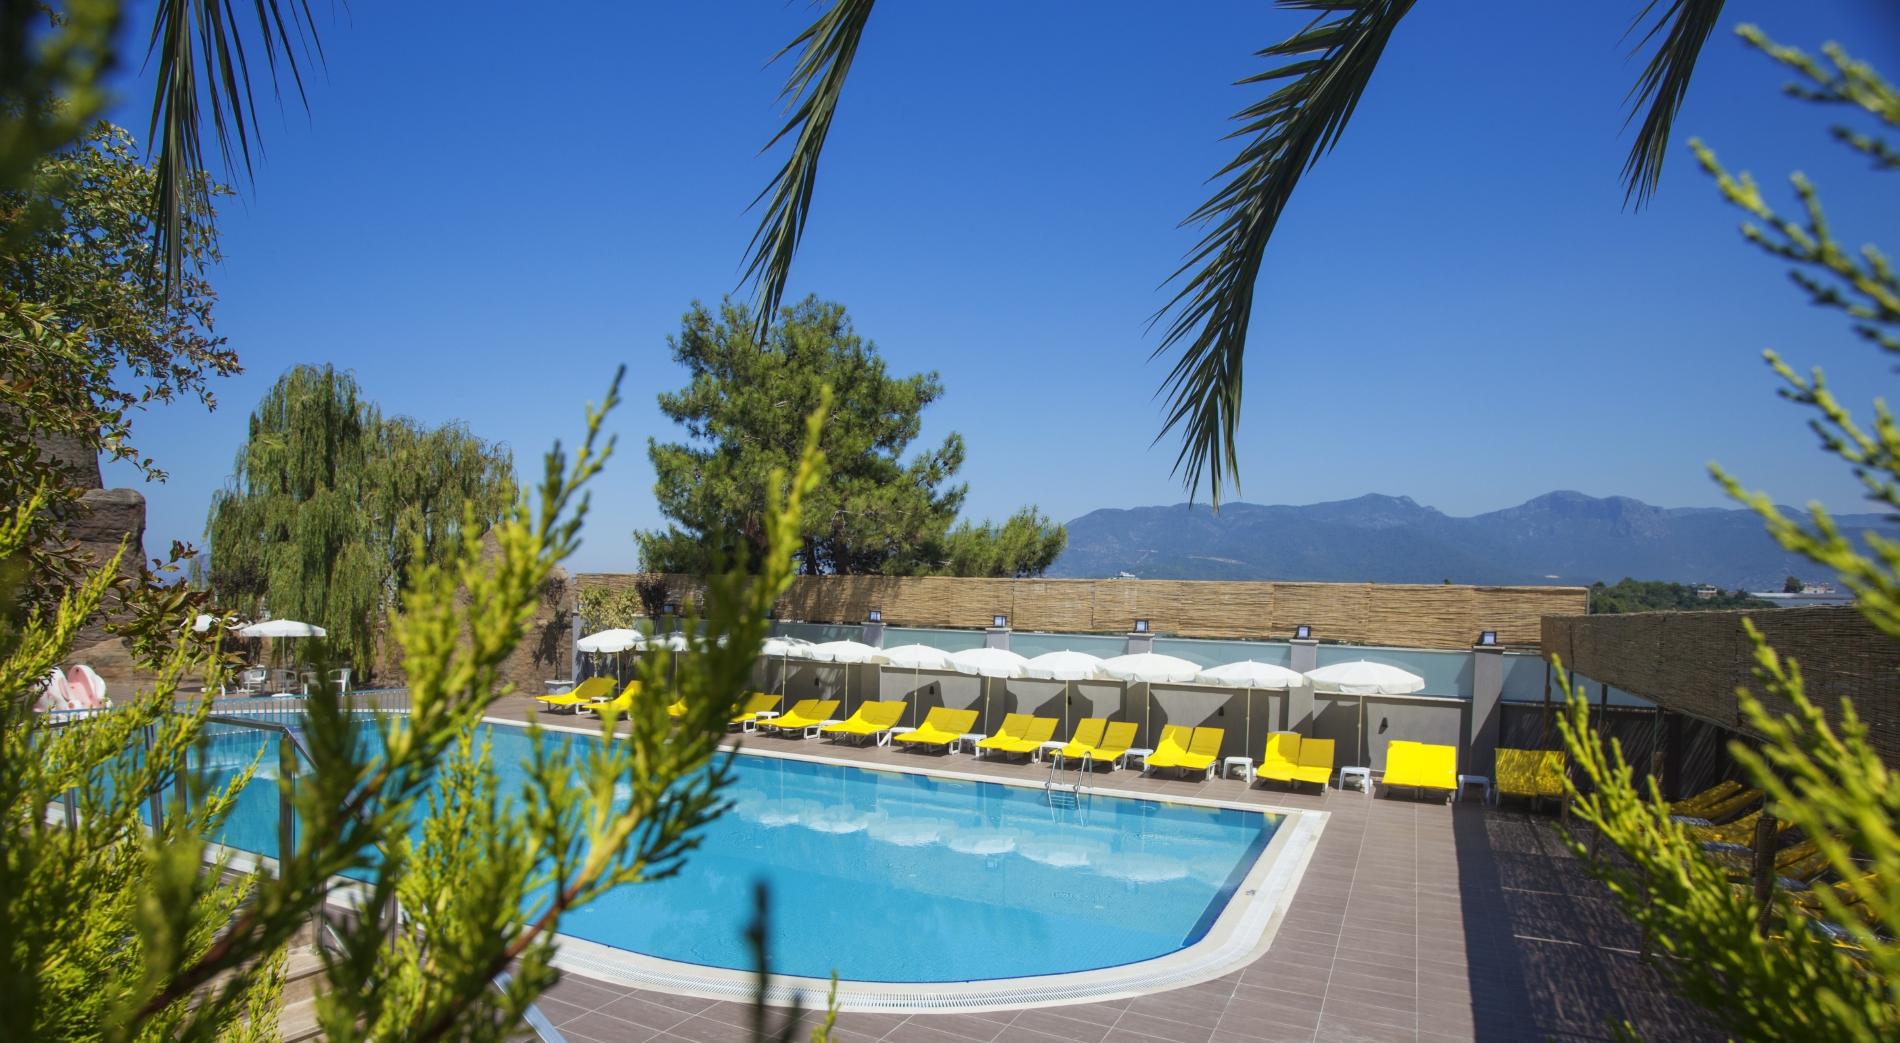 Akropol Resort & SPA Otel